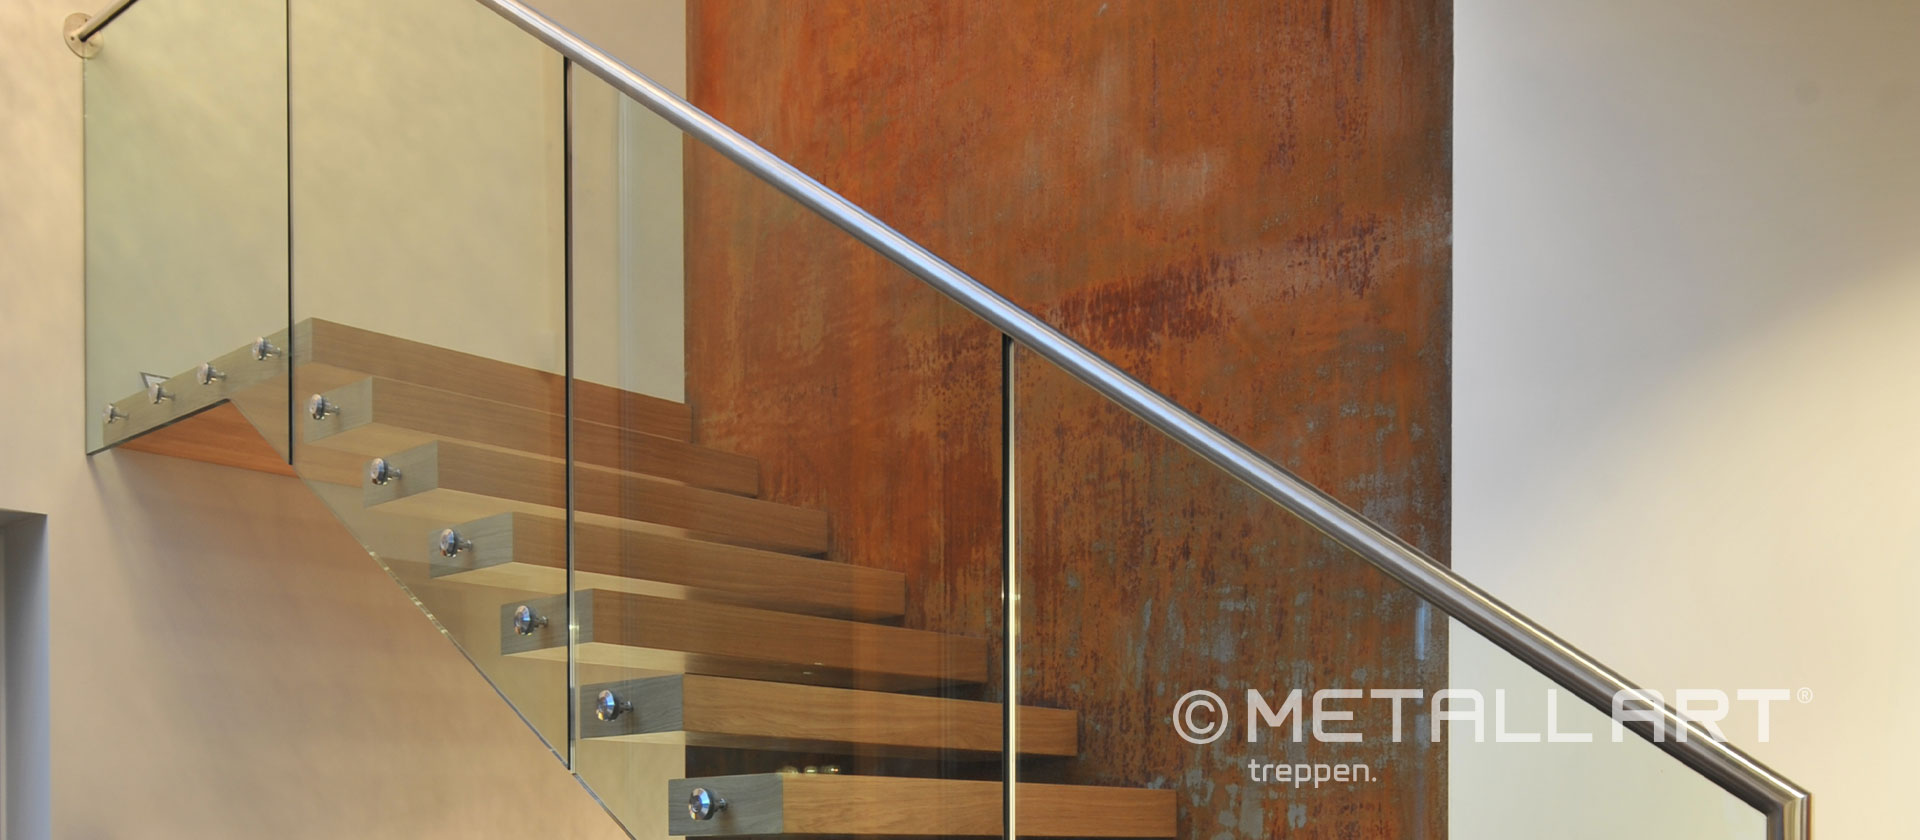 Holzstufen Treppe